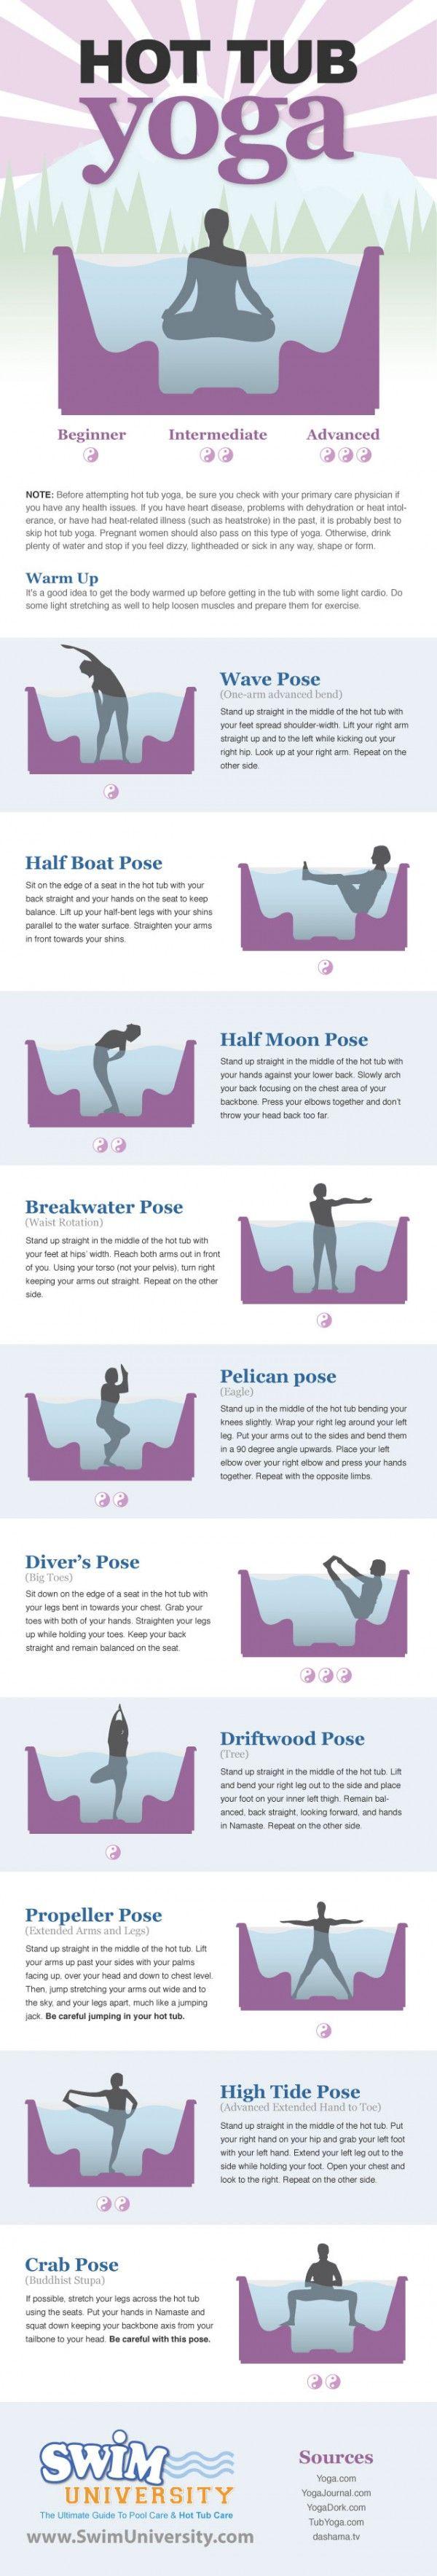 ¡Ejercítate en tu hidromasaje o bañera FIRPLAK!